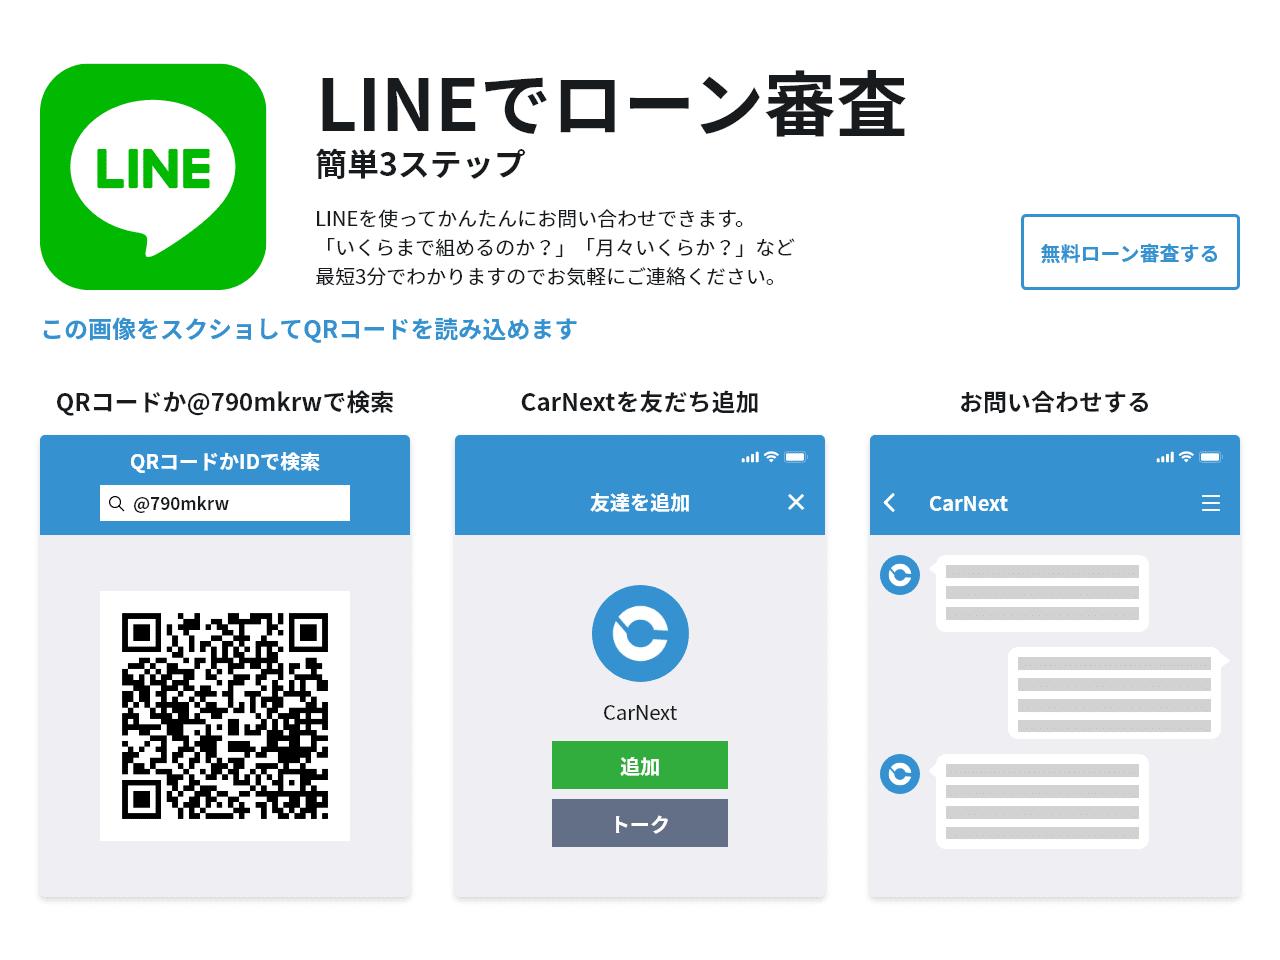 LINEでローン審査